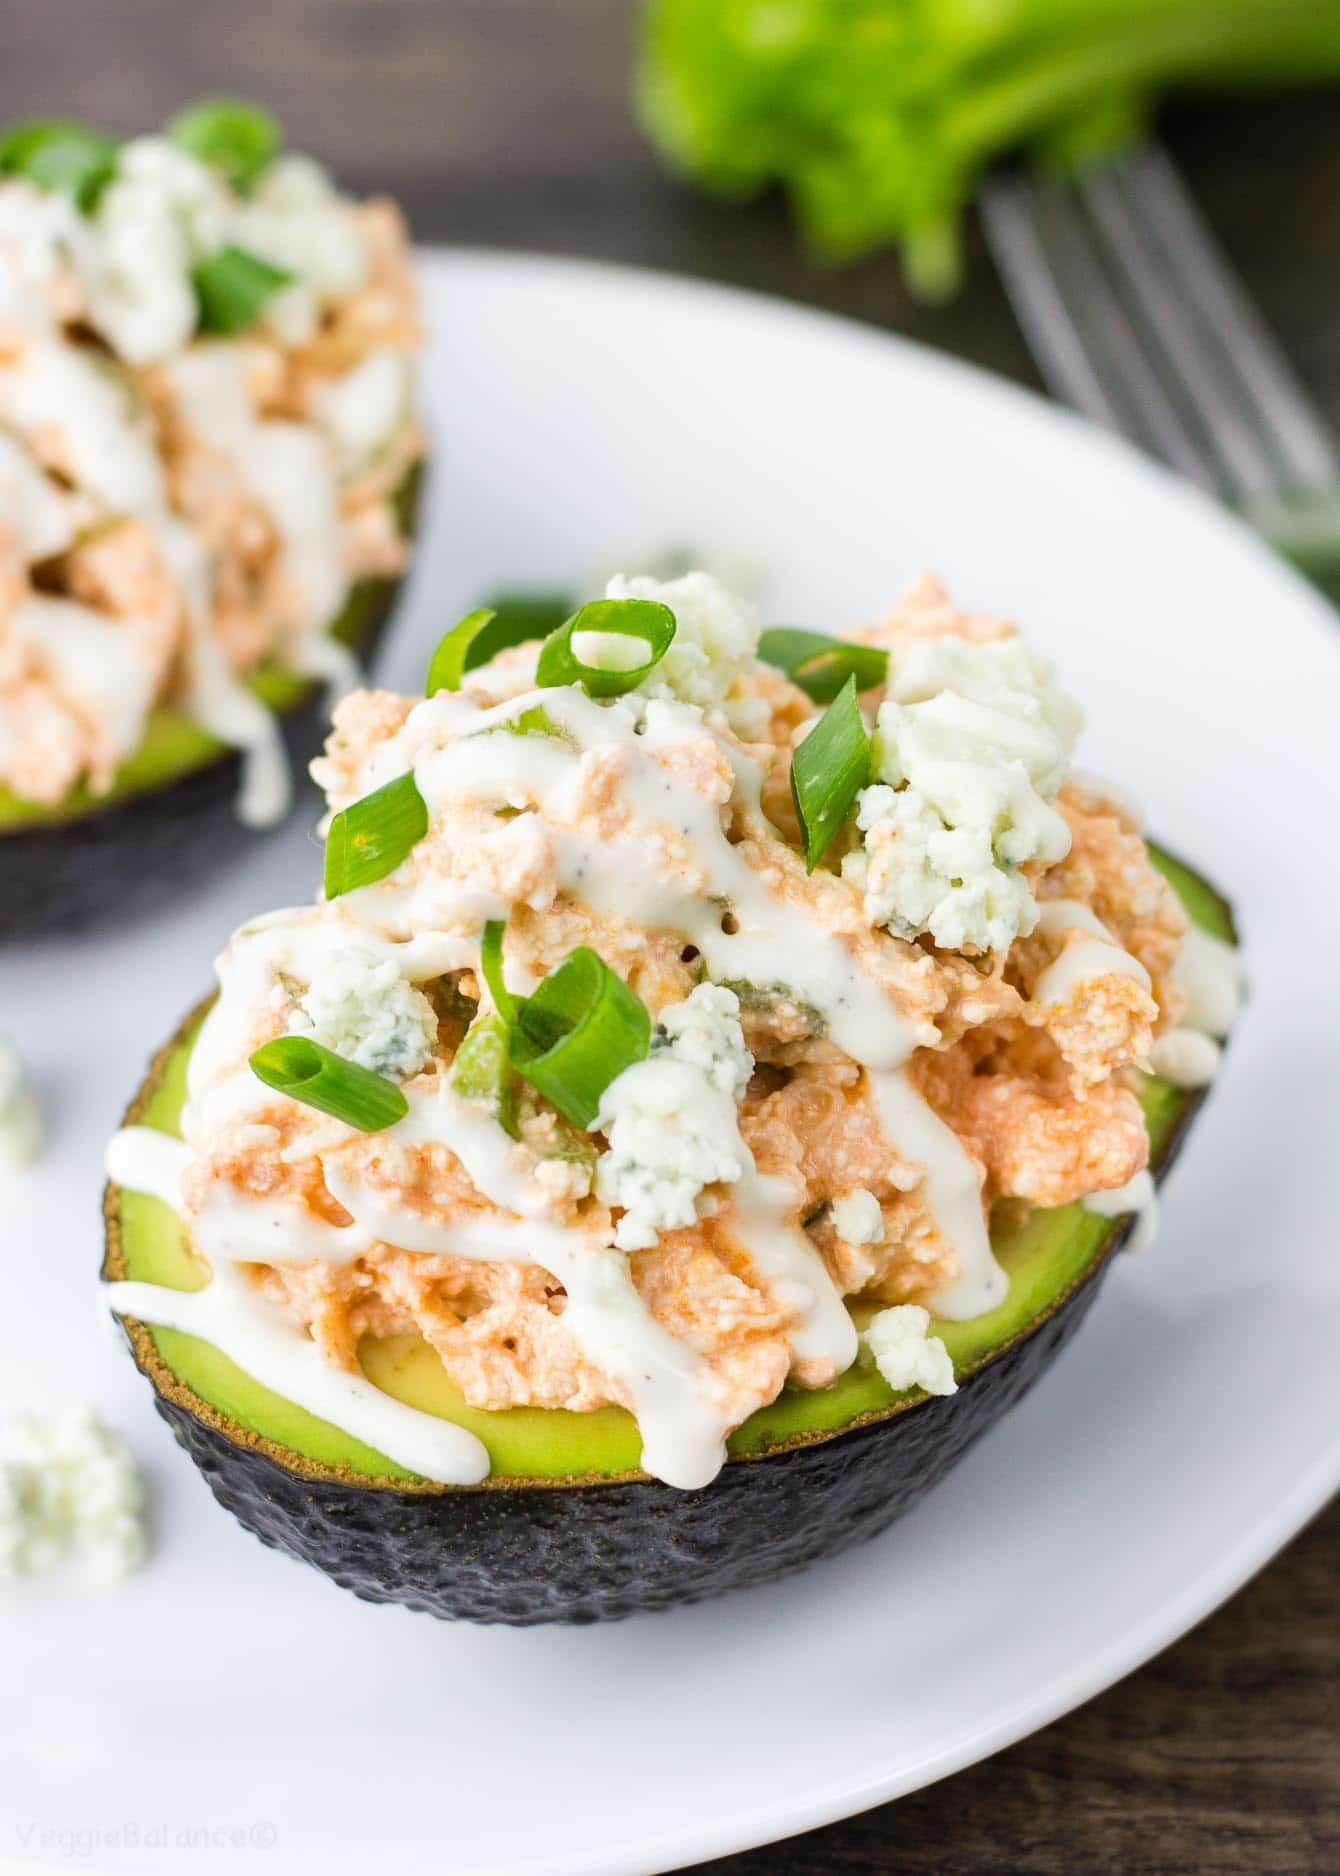 Buffalo Chicken Salad Stuffed Avocado recipe